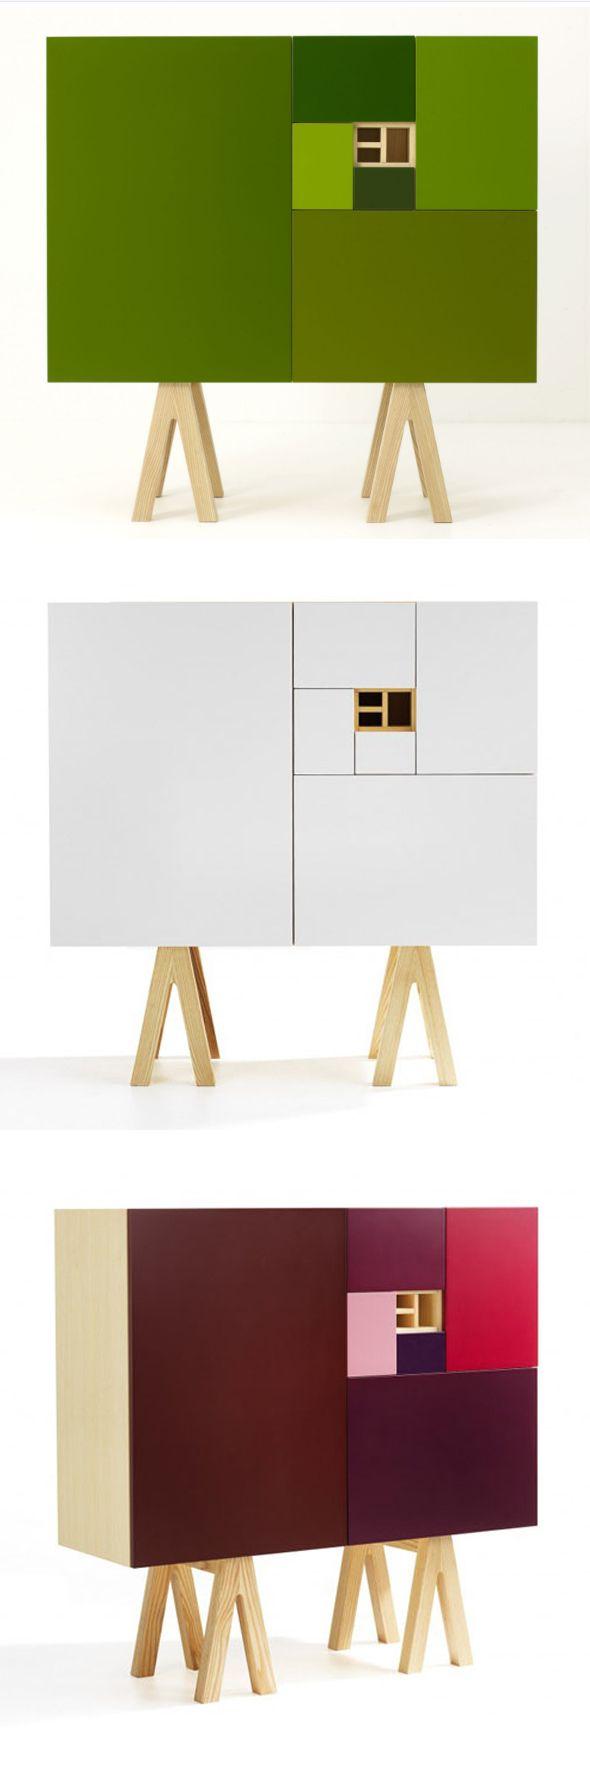 by Jesper Stahl >> Fibonacci's cabinet >> Cabinet of the Golden mean